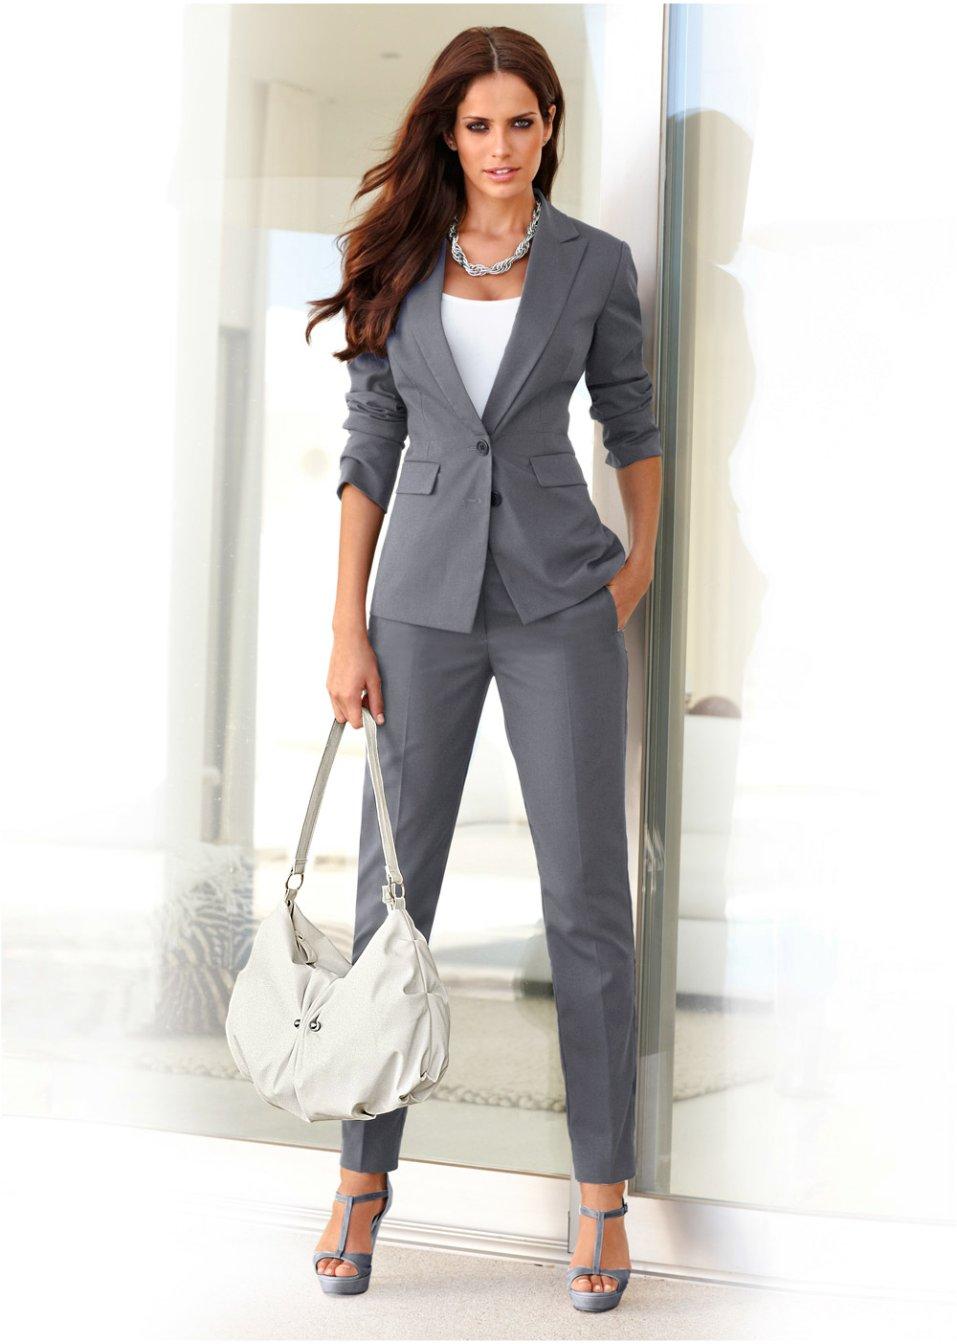 Matrimonio In Jeans E Giacca : Tailleur grigio bodyflirt bonprix